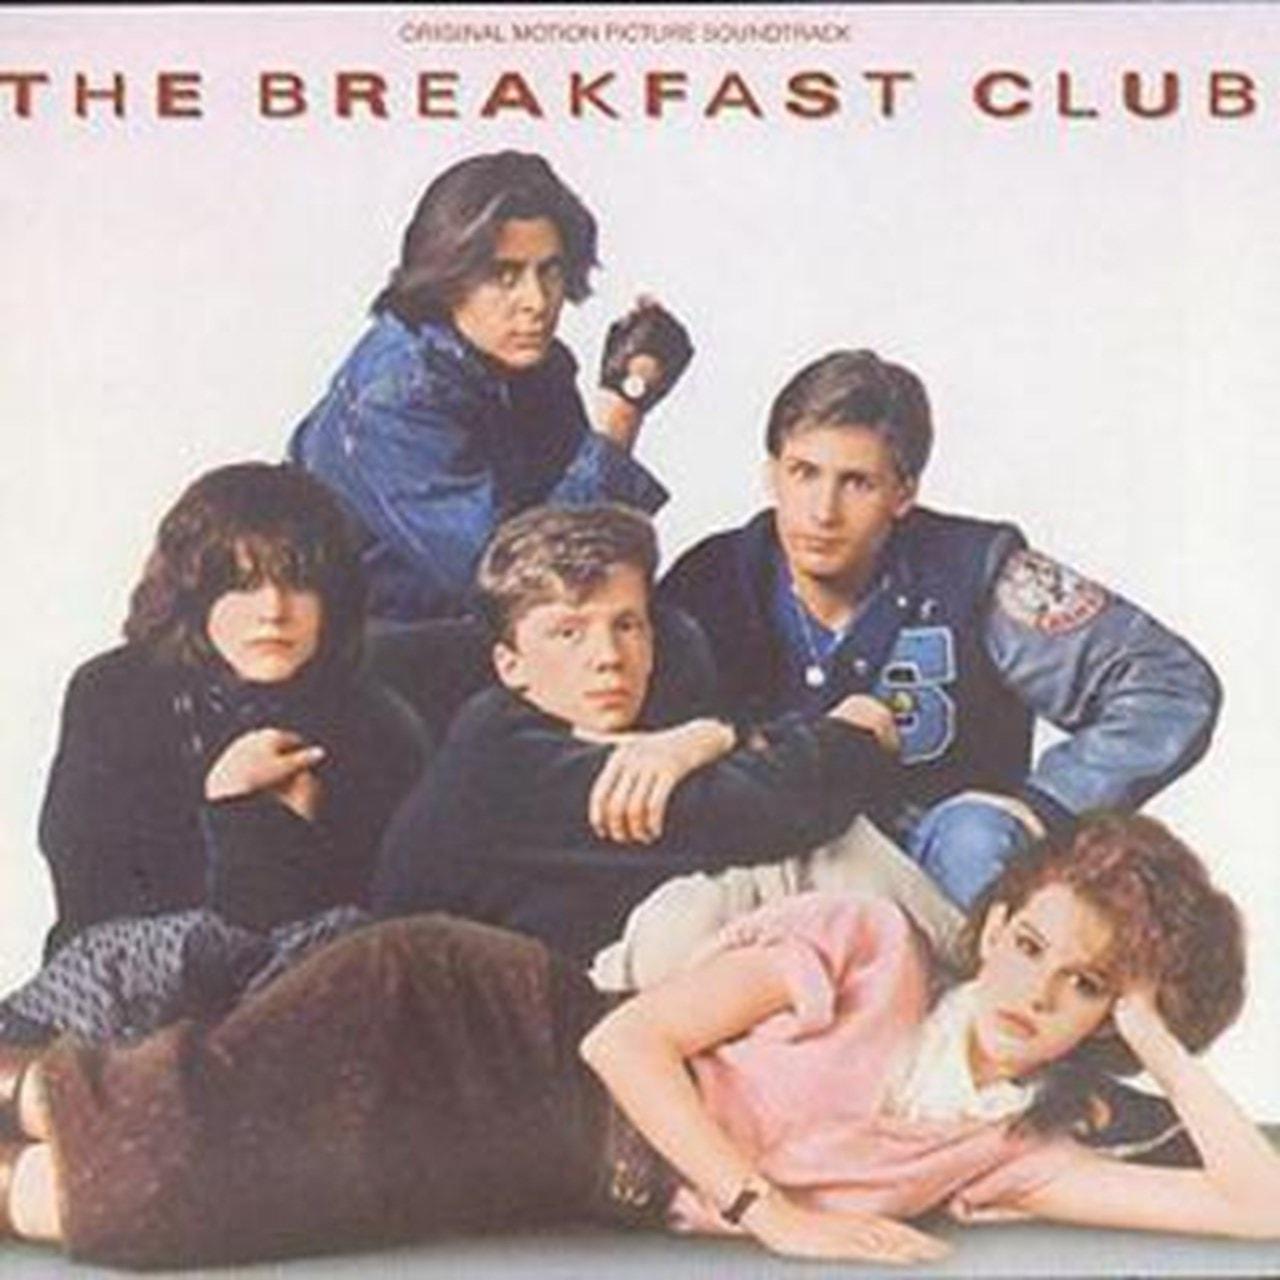 The Breakfast Club - 1